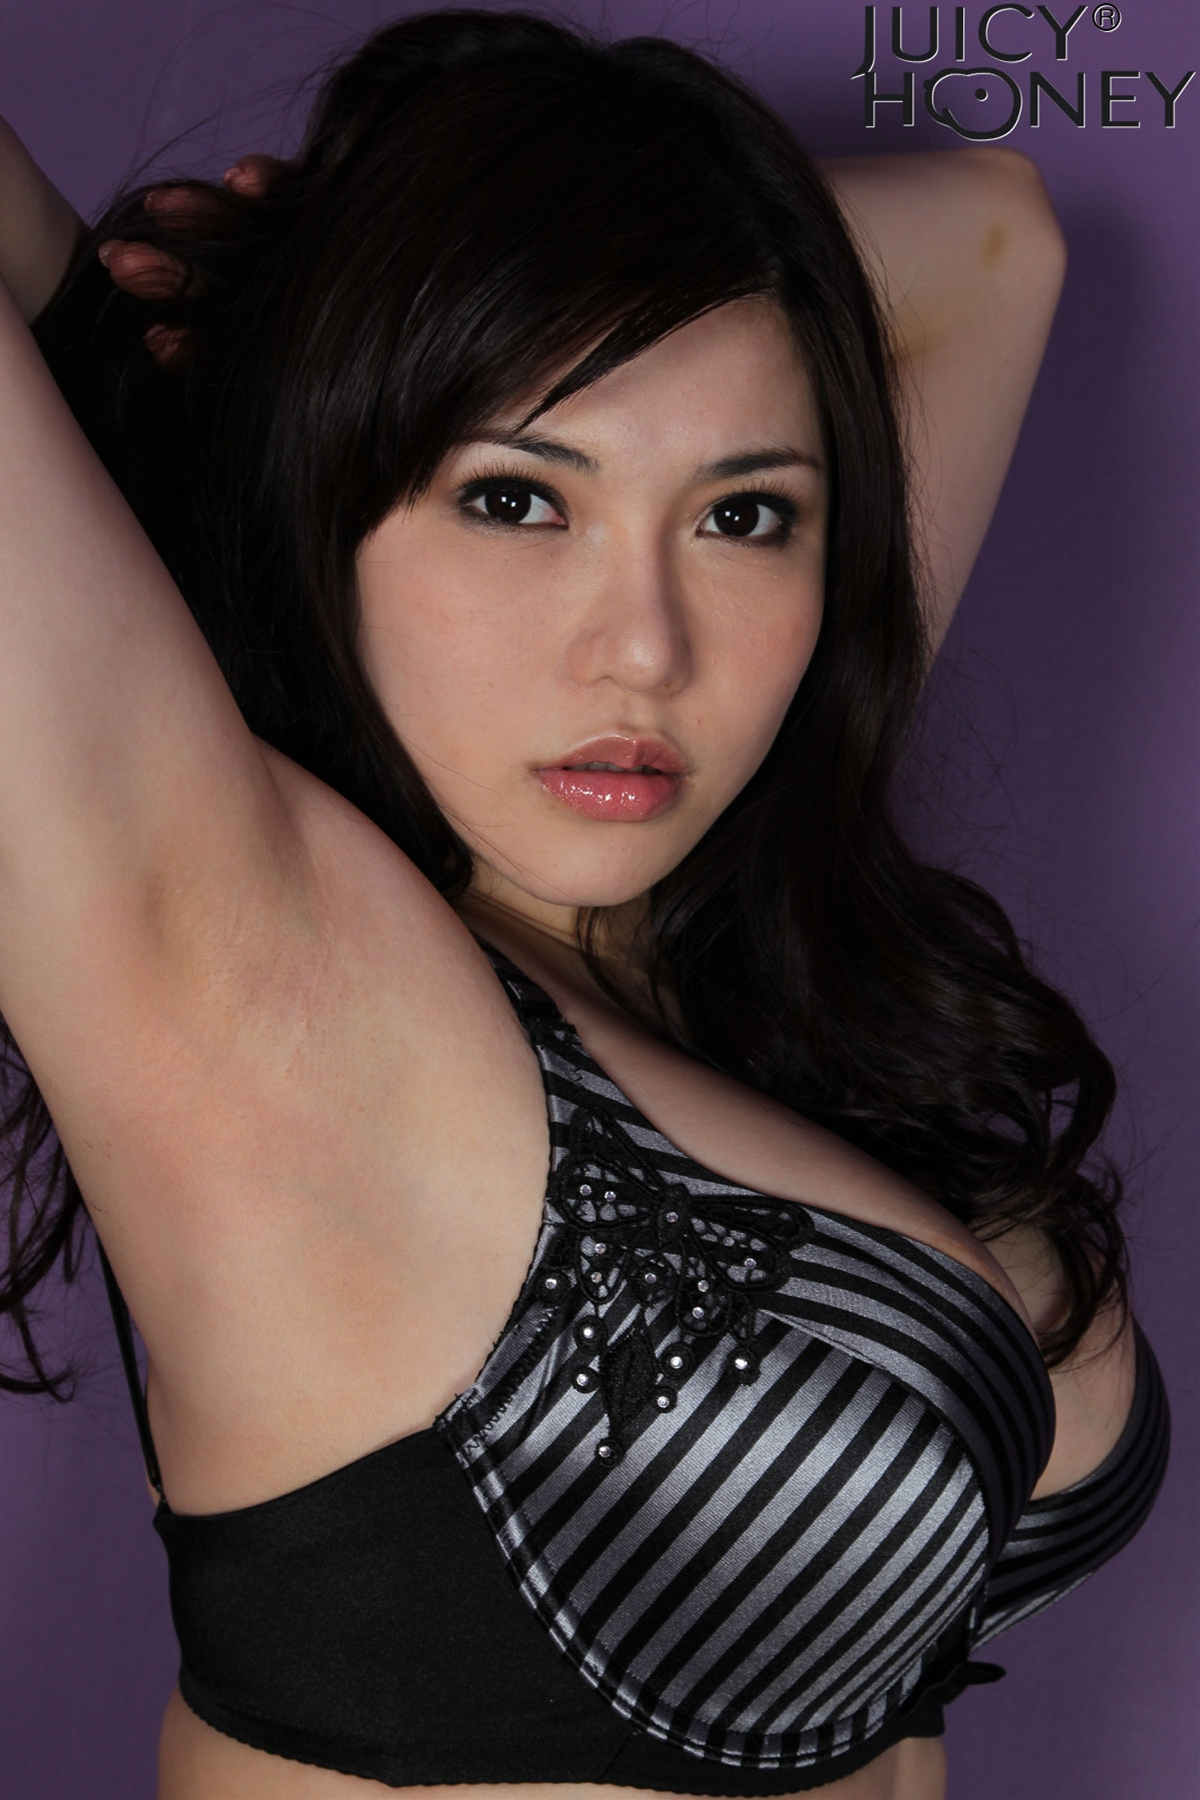 anri-okita-00863441